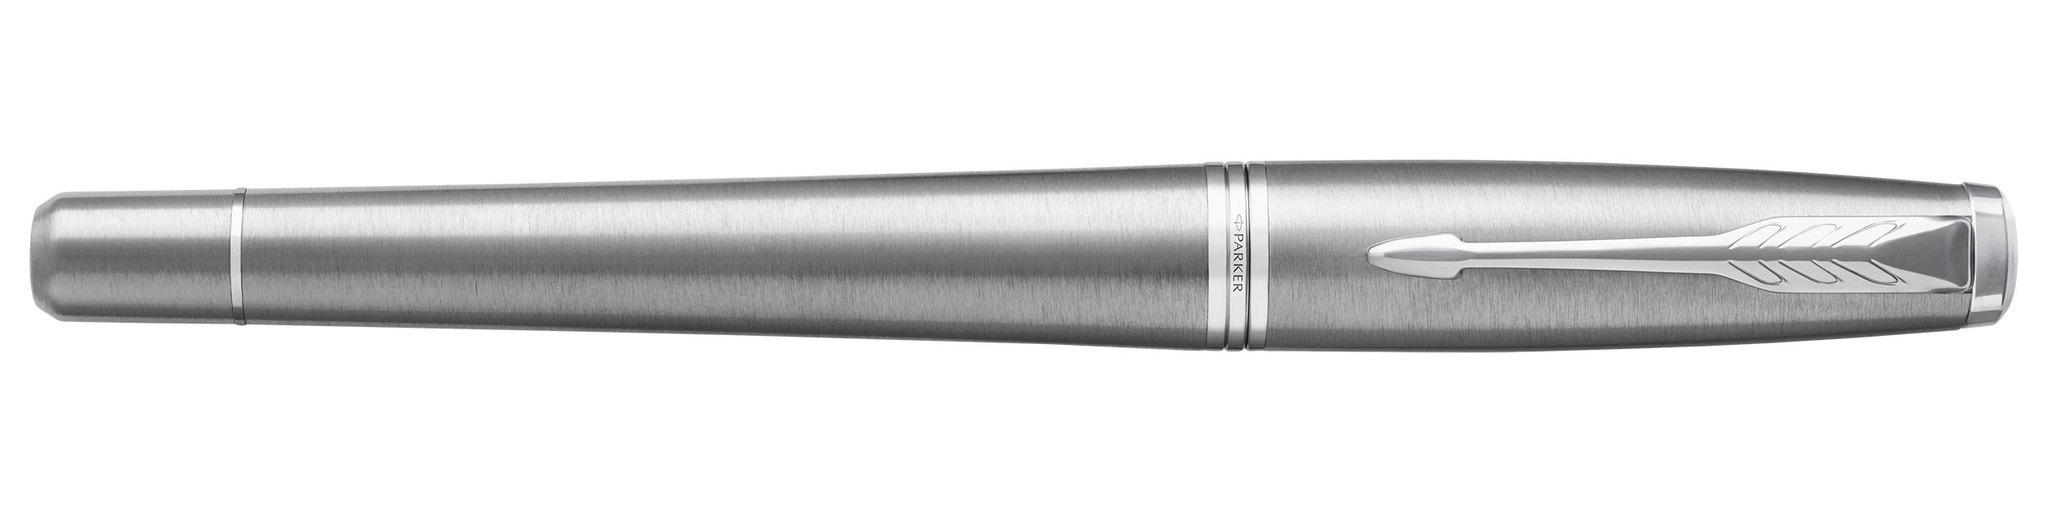 Parker Urban Core - Metro Metallic CT, ручка-роллер, F, BL